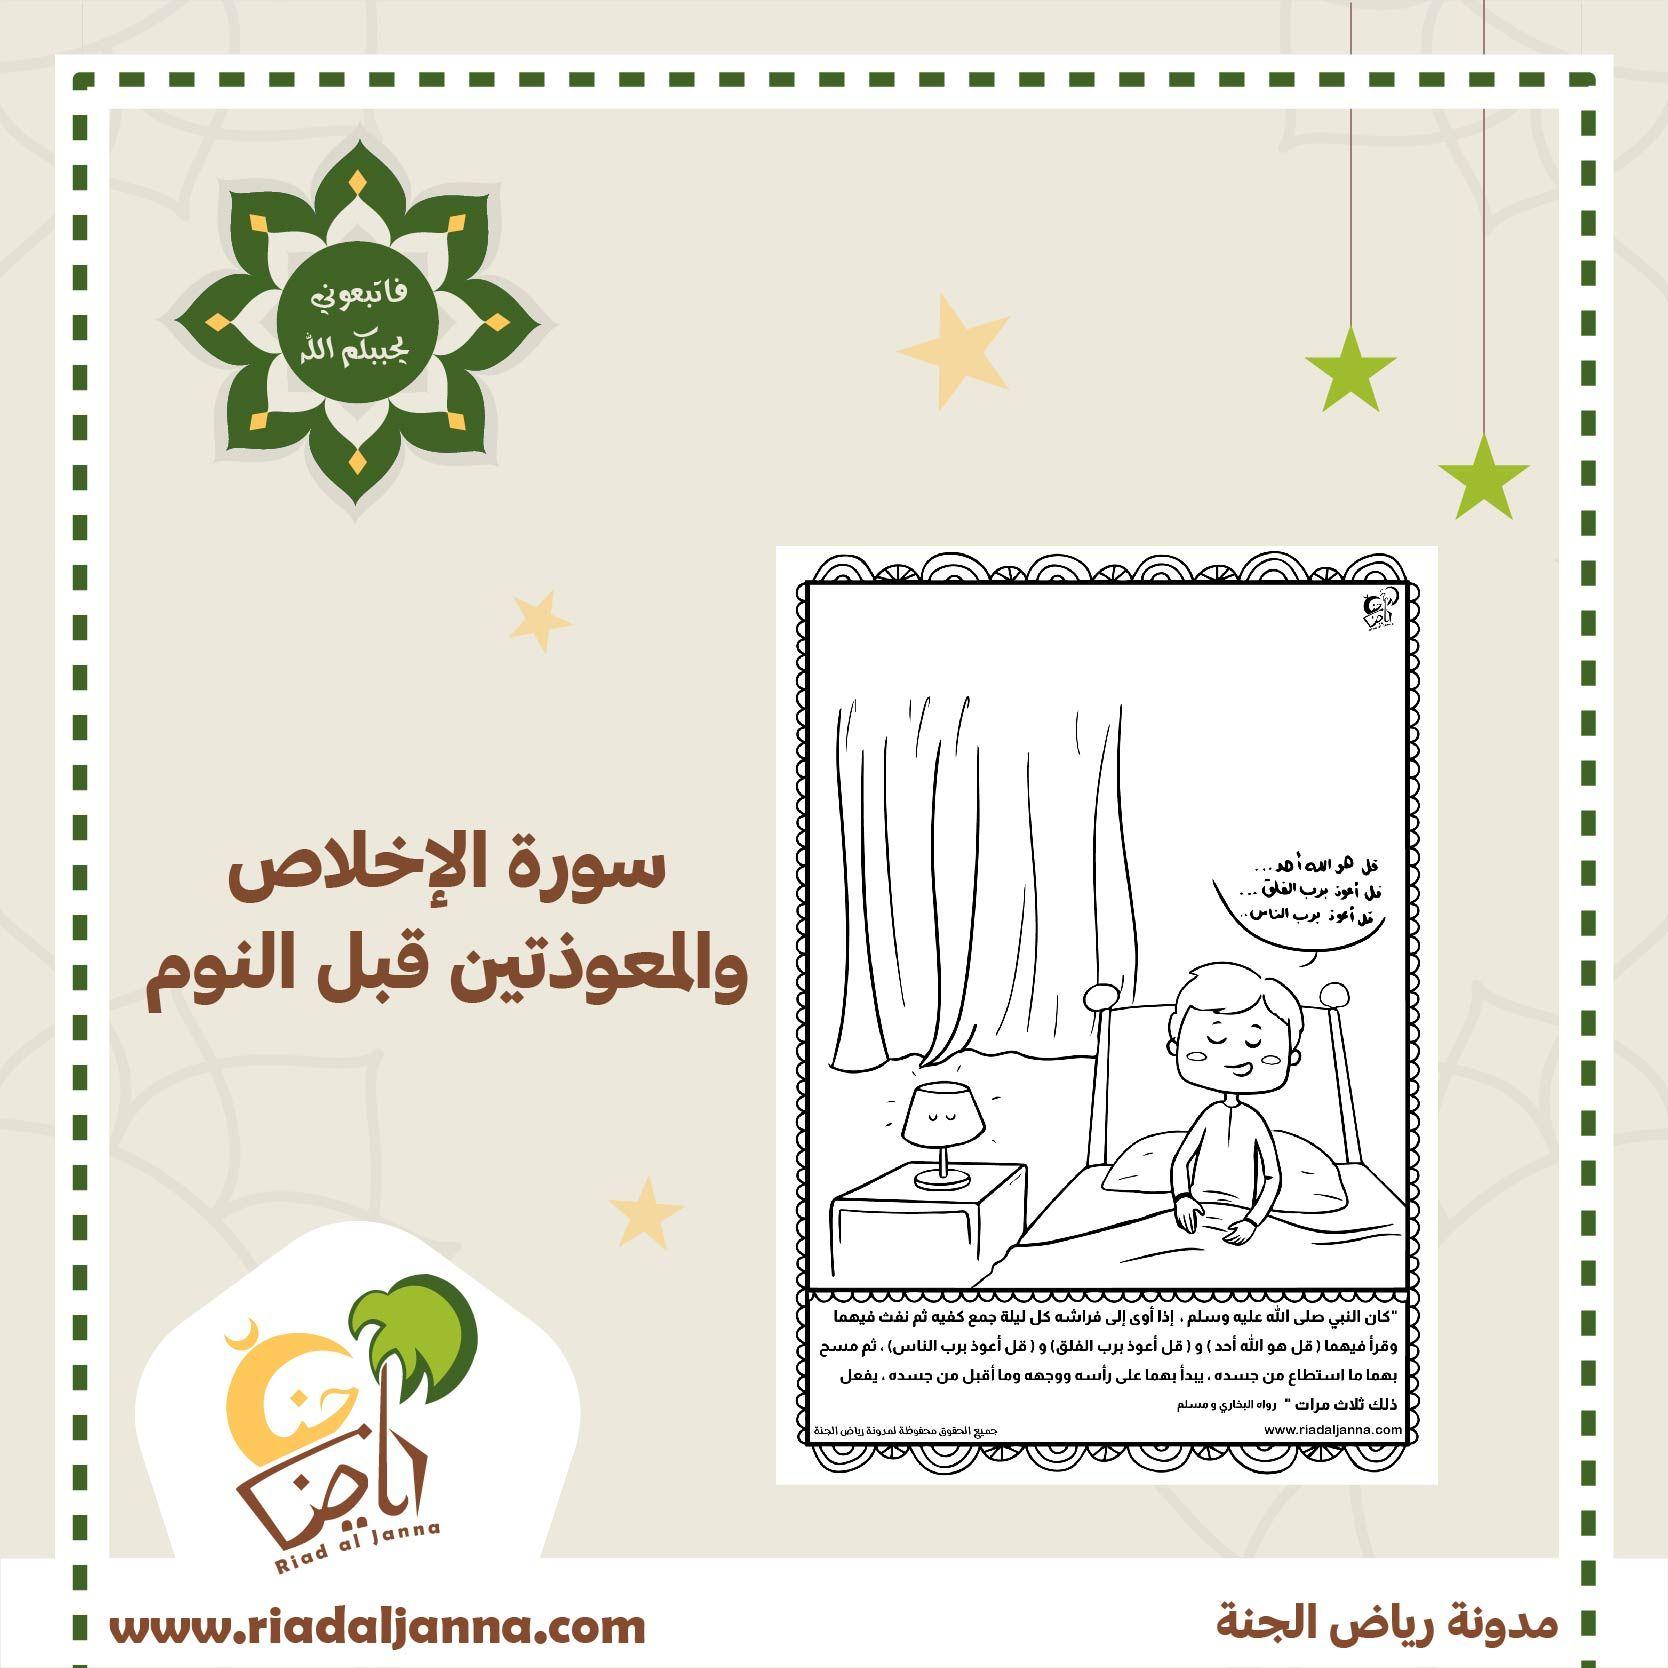 Pin By مدونة رياض الجنة On فاتبعوني يحببكم الله Kids Sheets Comics Kids